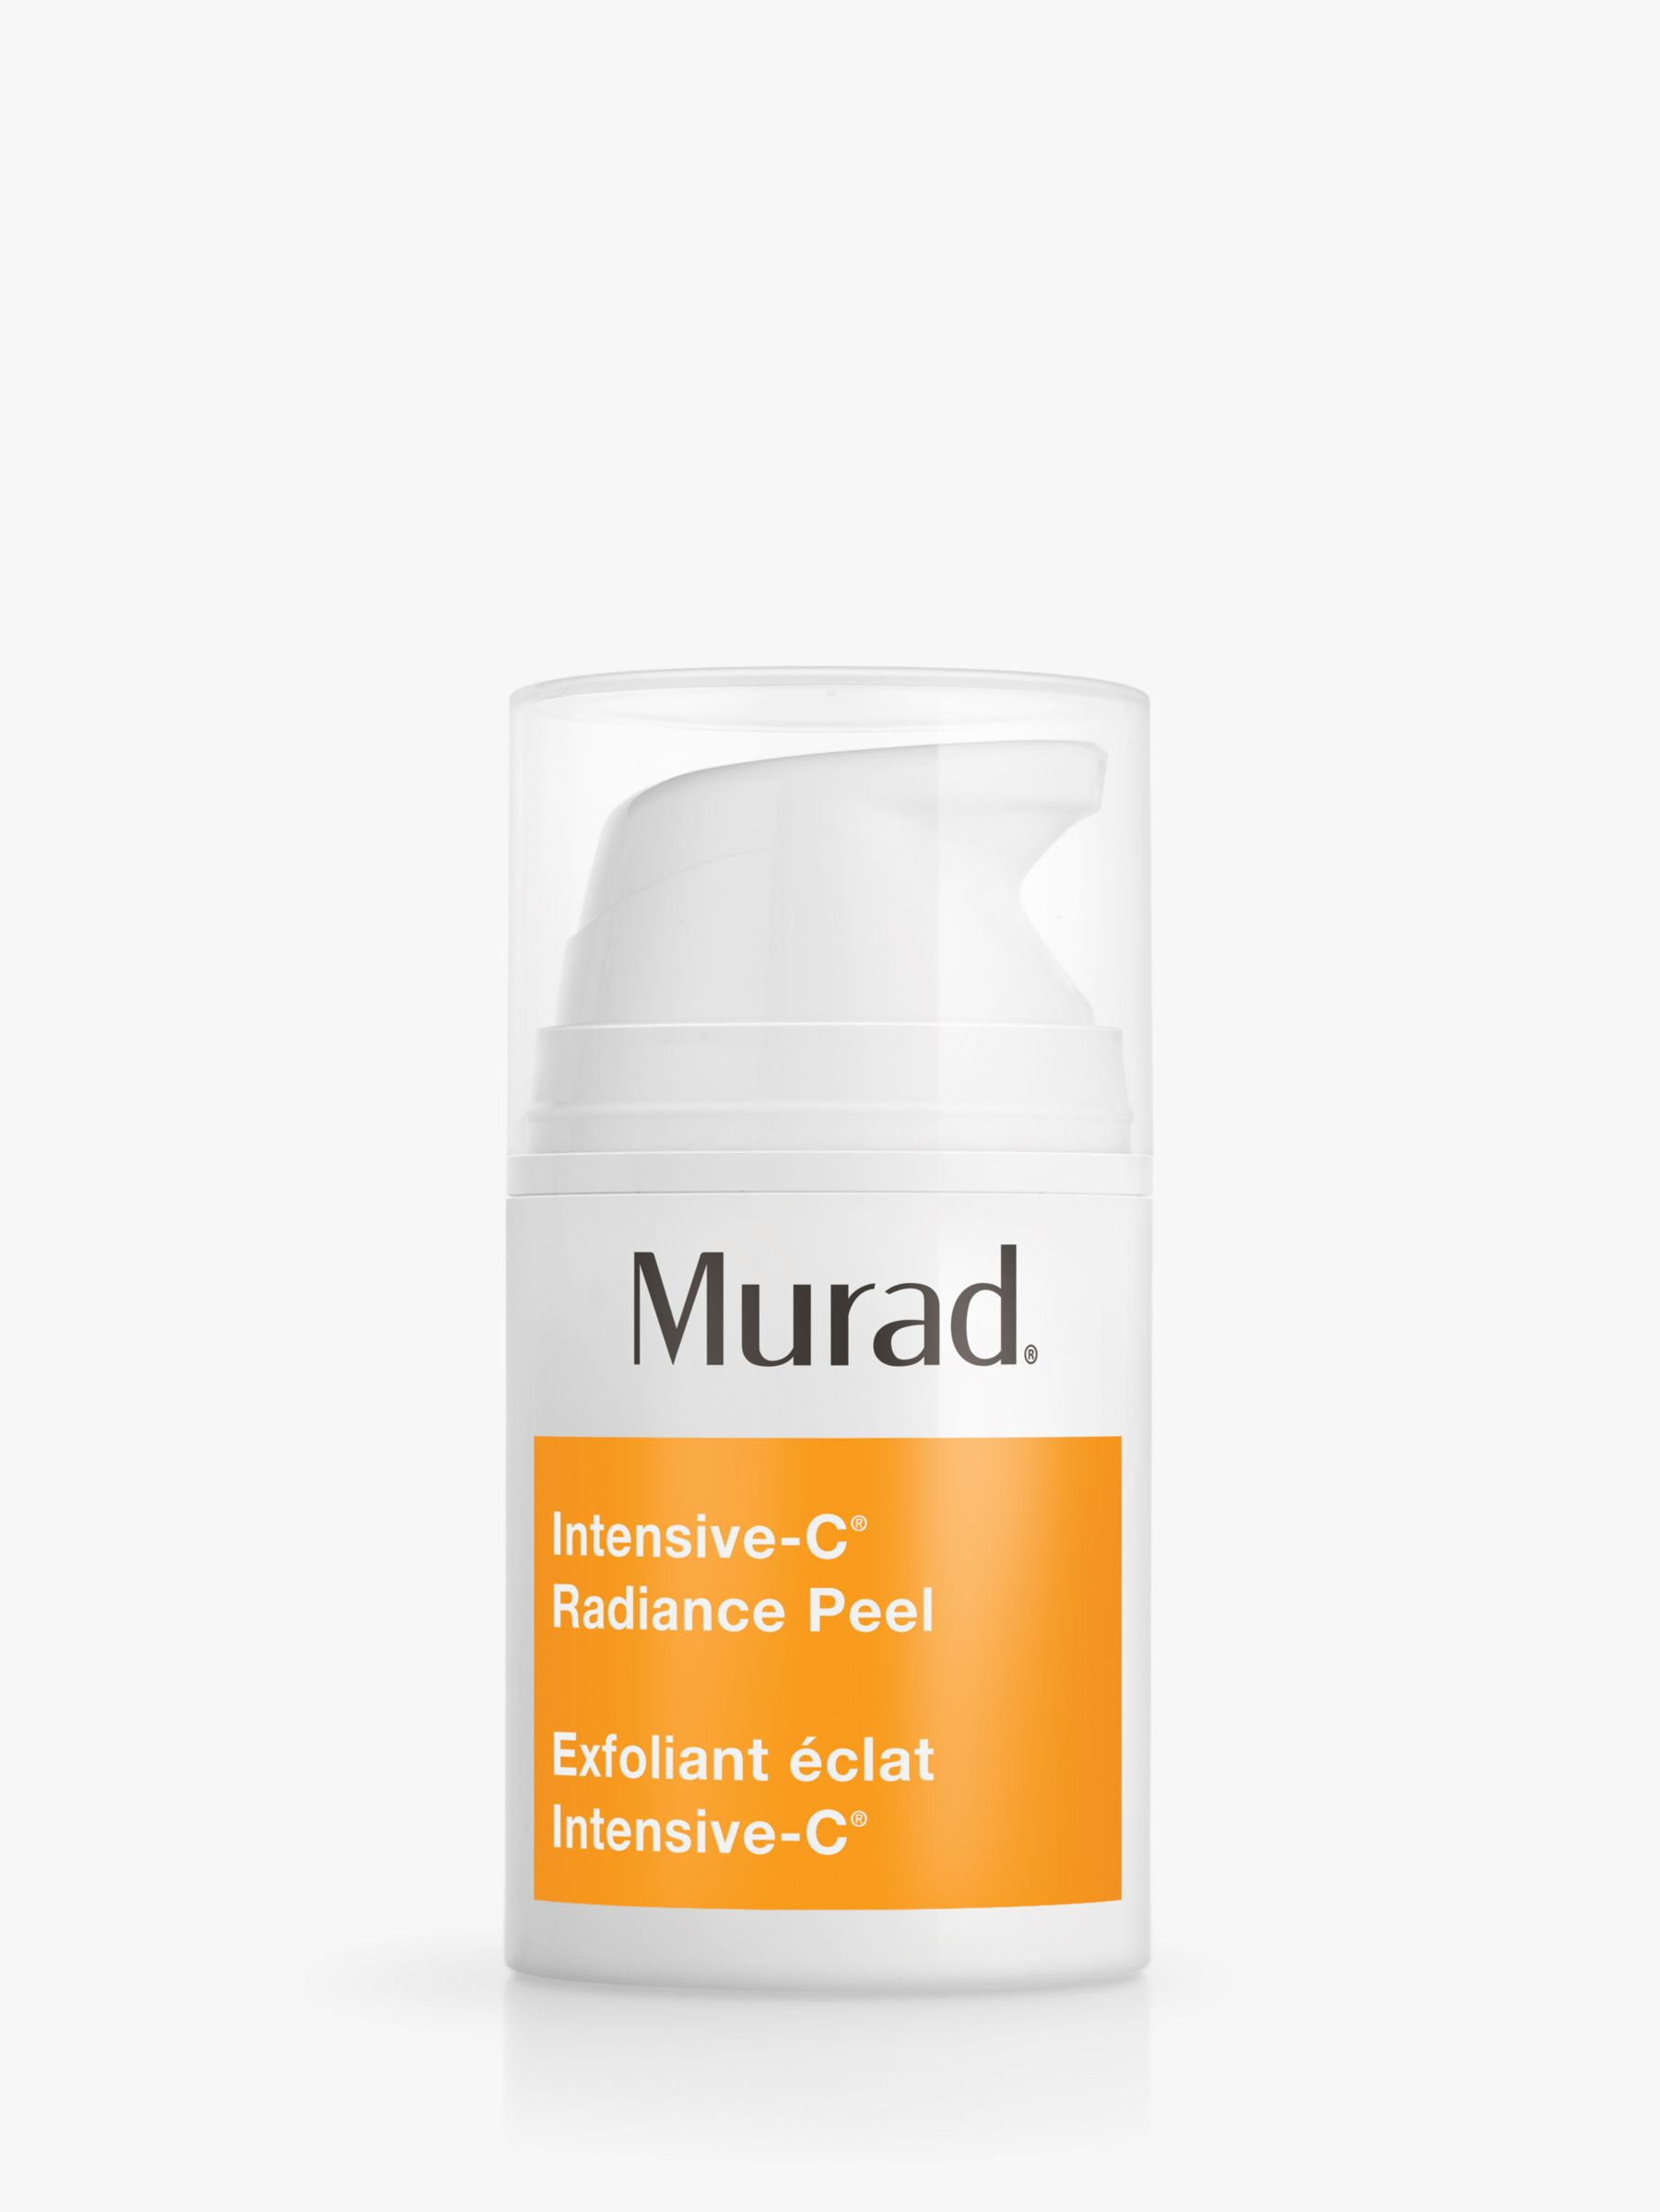 Murad Murad Intensive-C Radiance Peel, 50ml